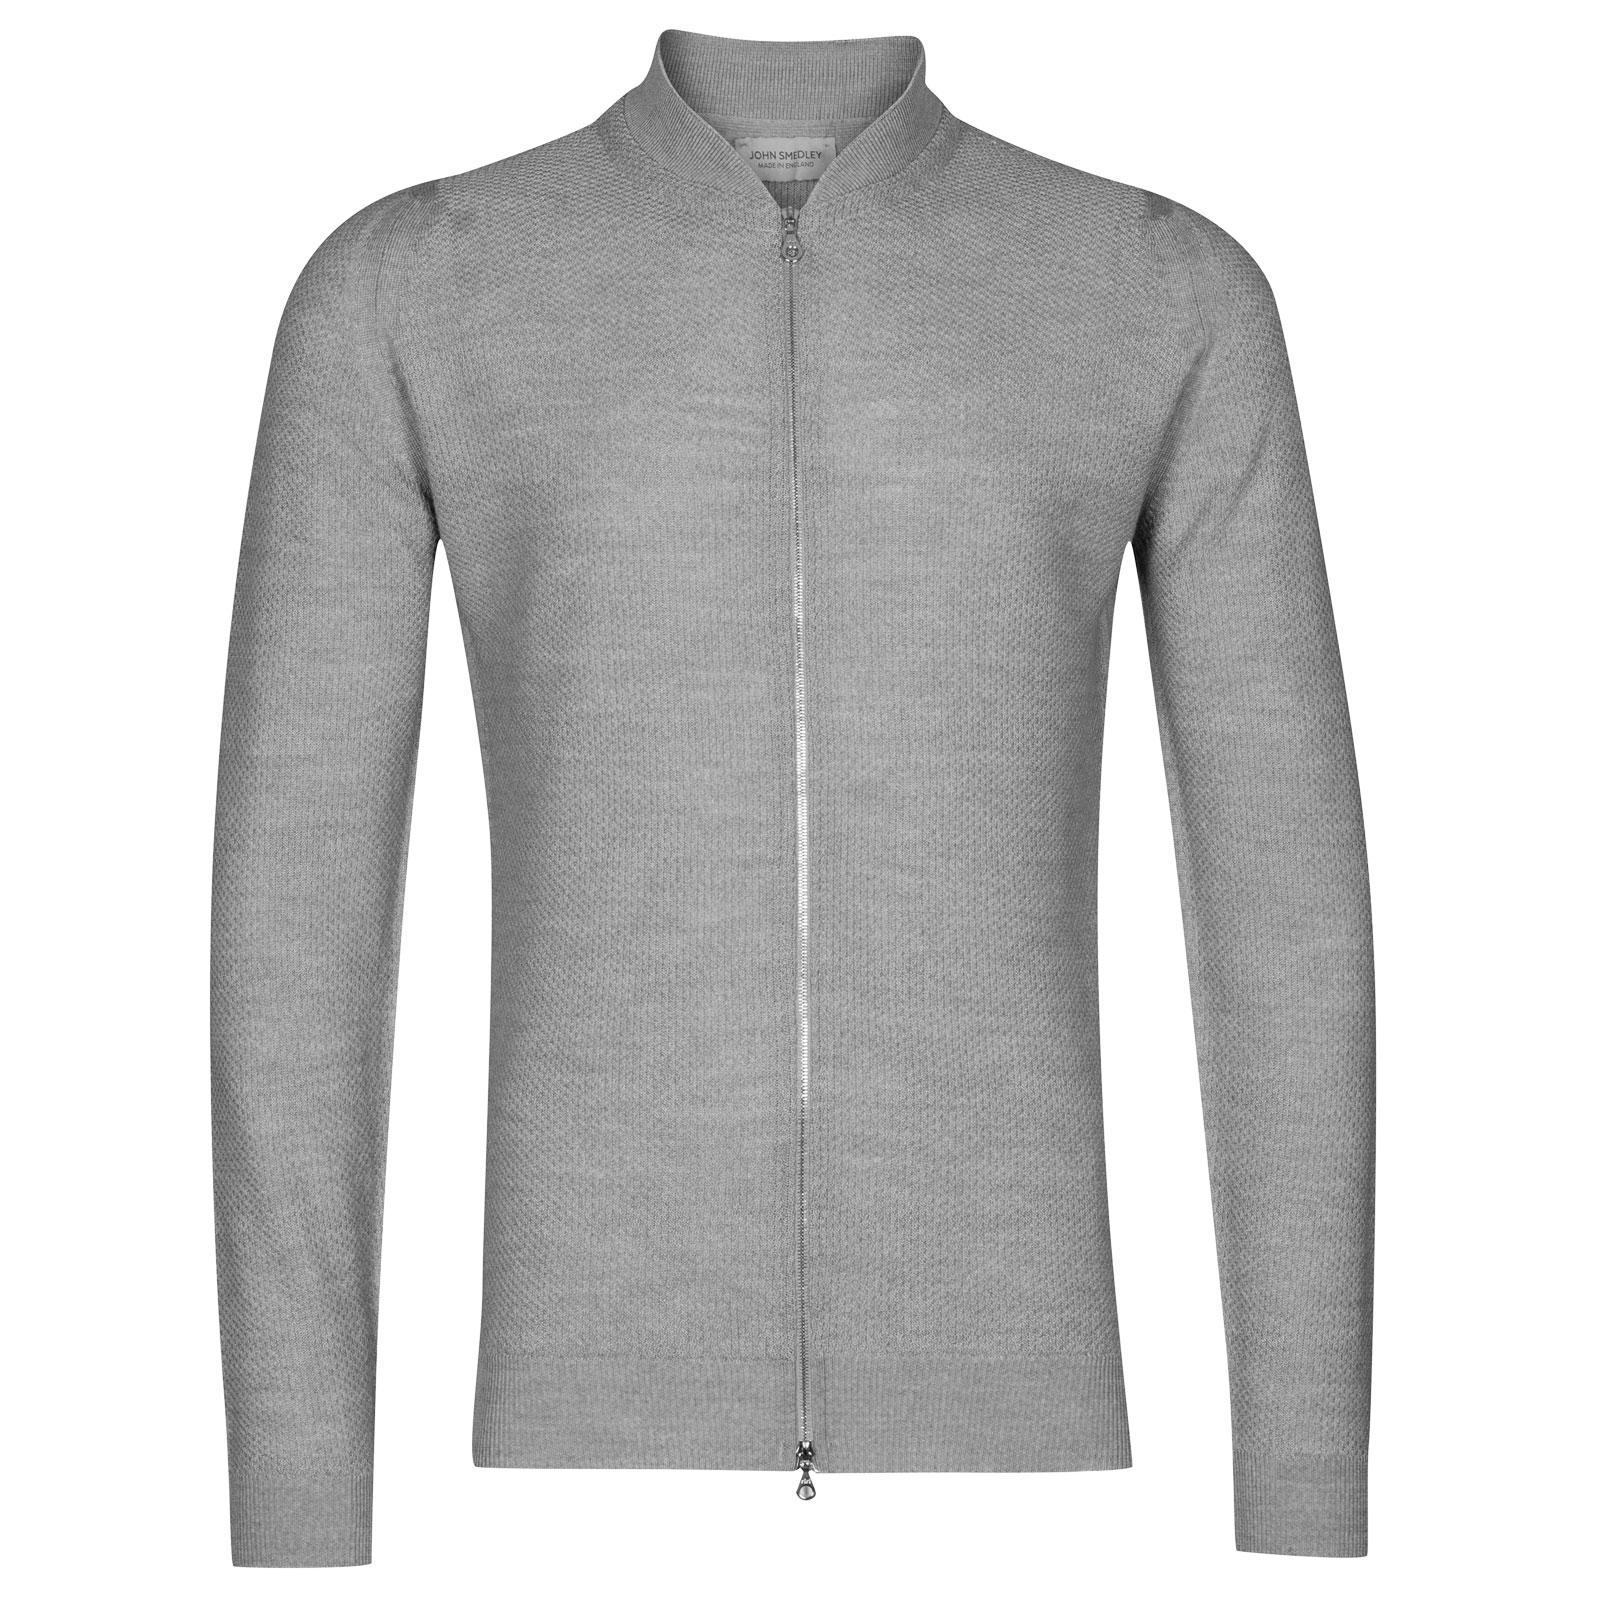 John Smedley 6Singular Merino Wool Jacket in Bardot Grey-XS